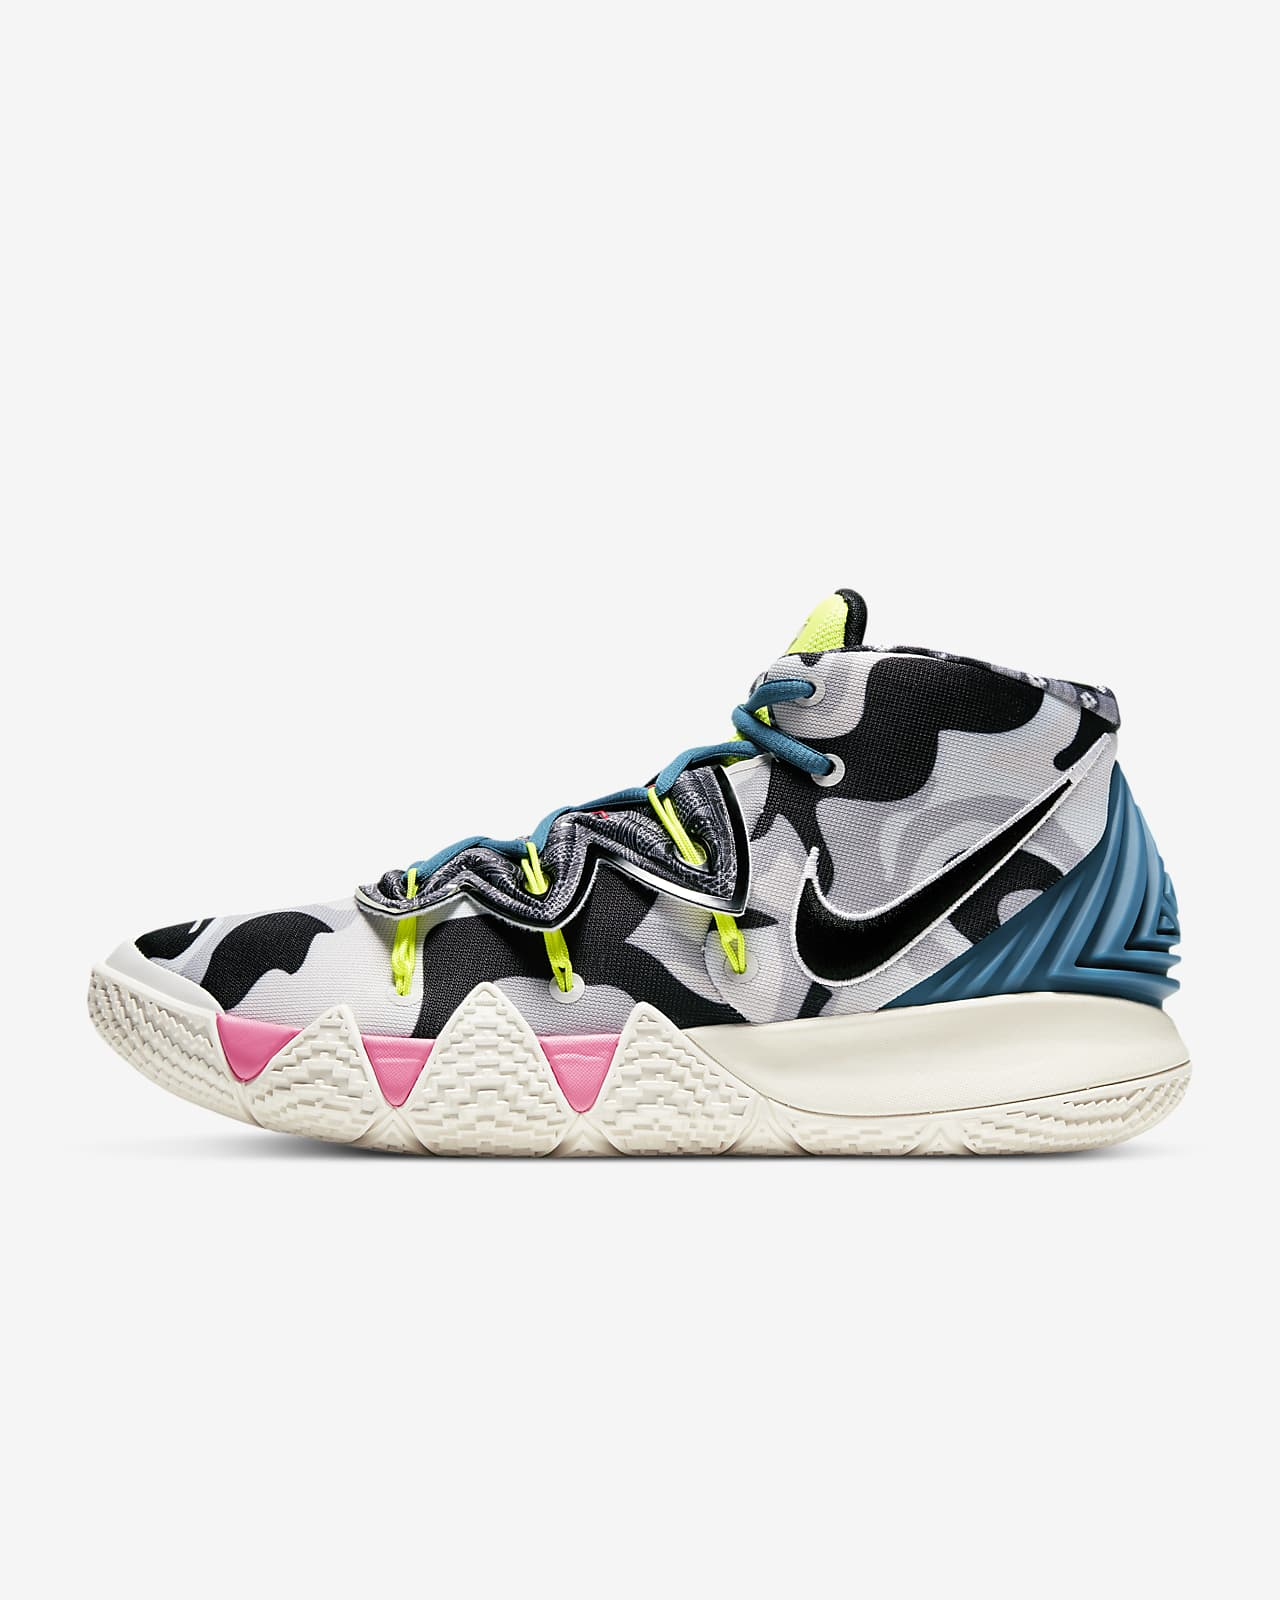 Kybrid S2 Basketball Shoe. Nike NL